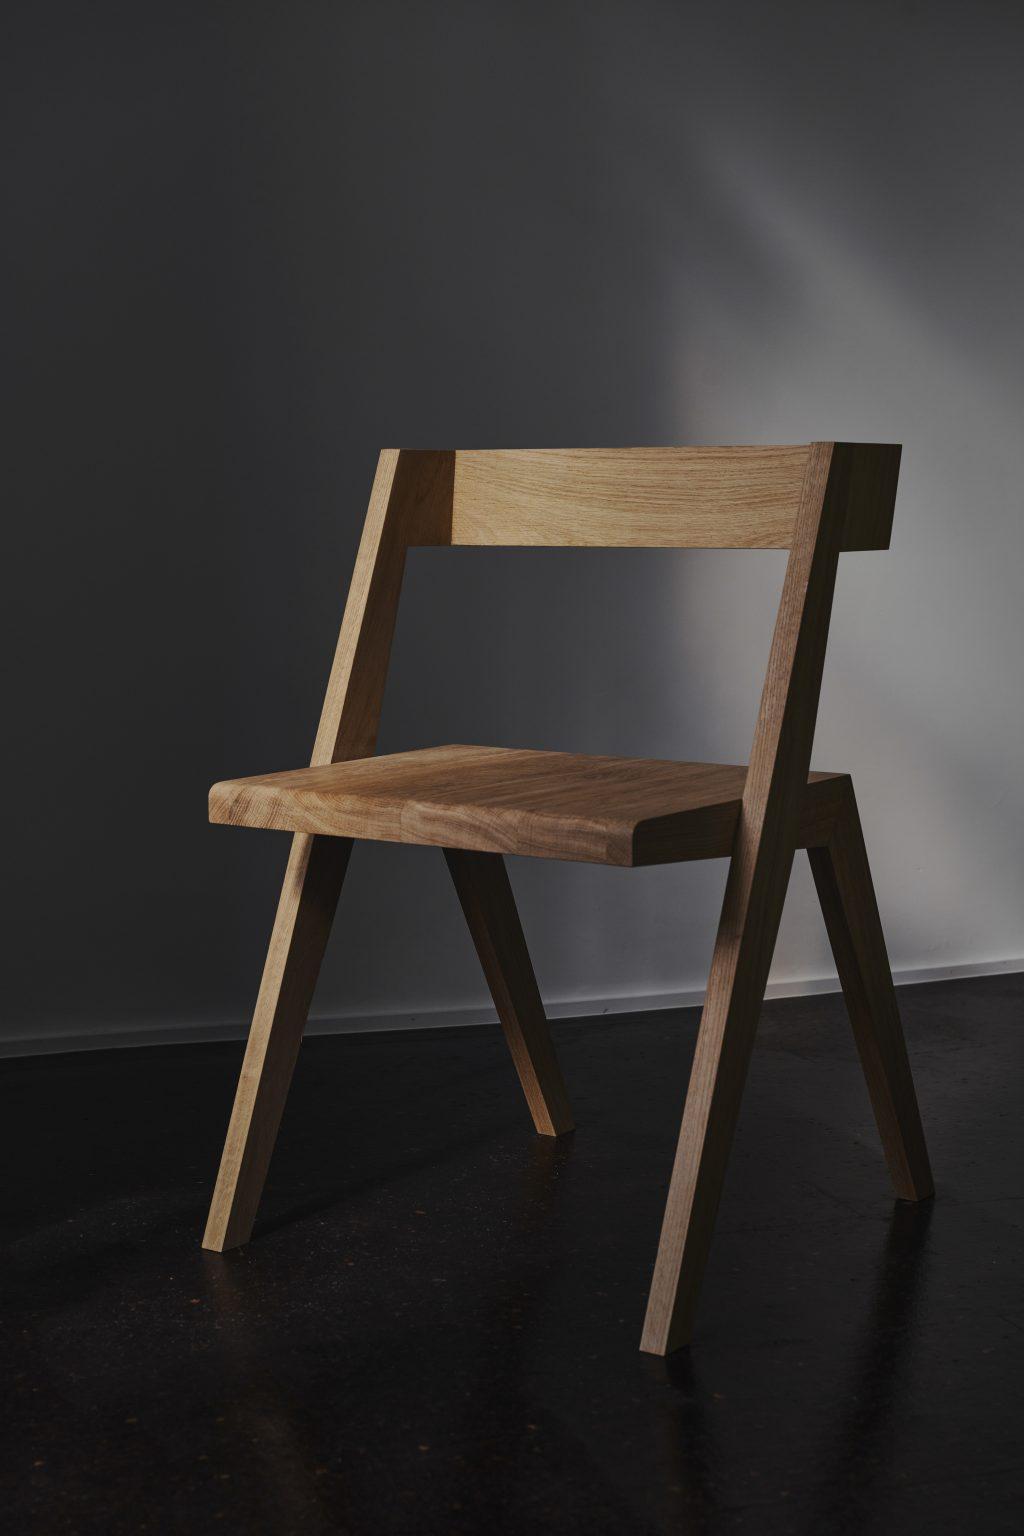 Biennale Interieur - Belgium's leading design and interior event - Ykoon-chair-x-damon-de-backer-2021-bis-02.jpg